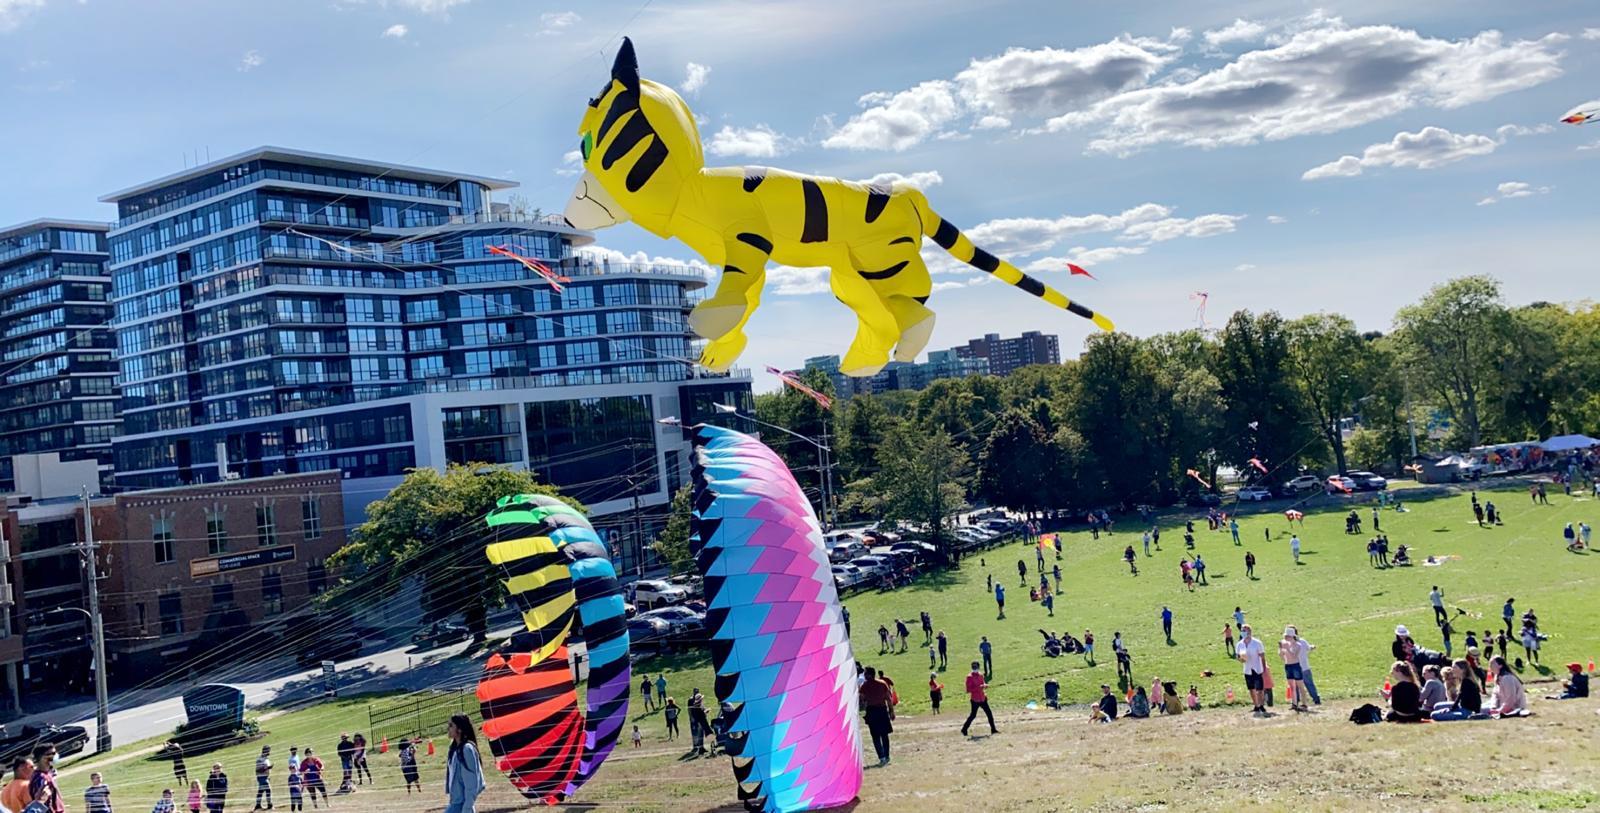 East Coast Kite Festival 2021